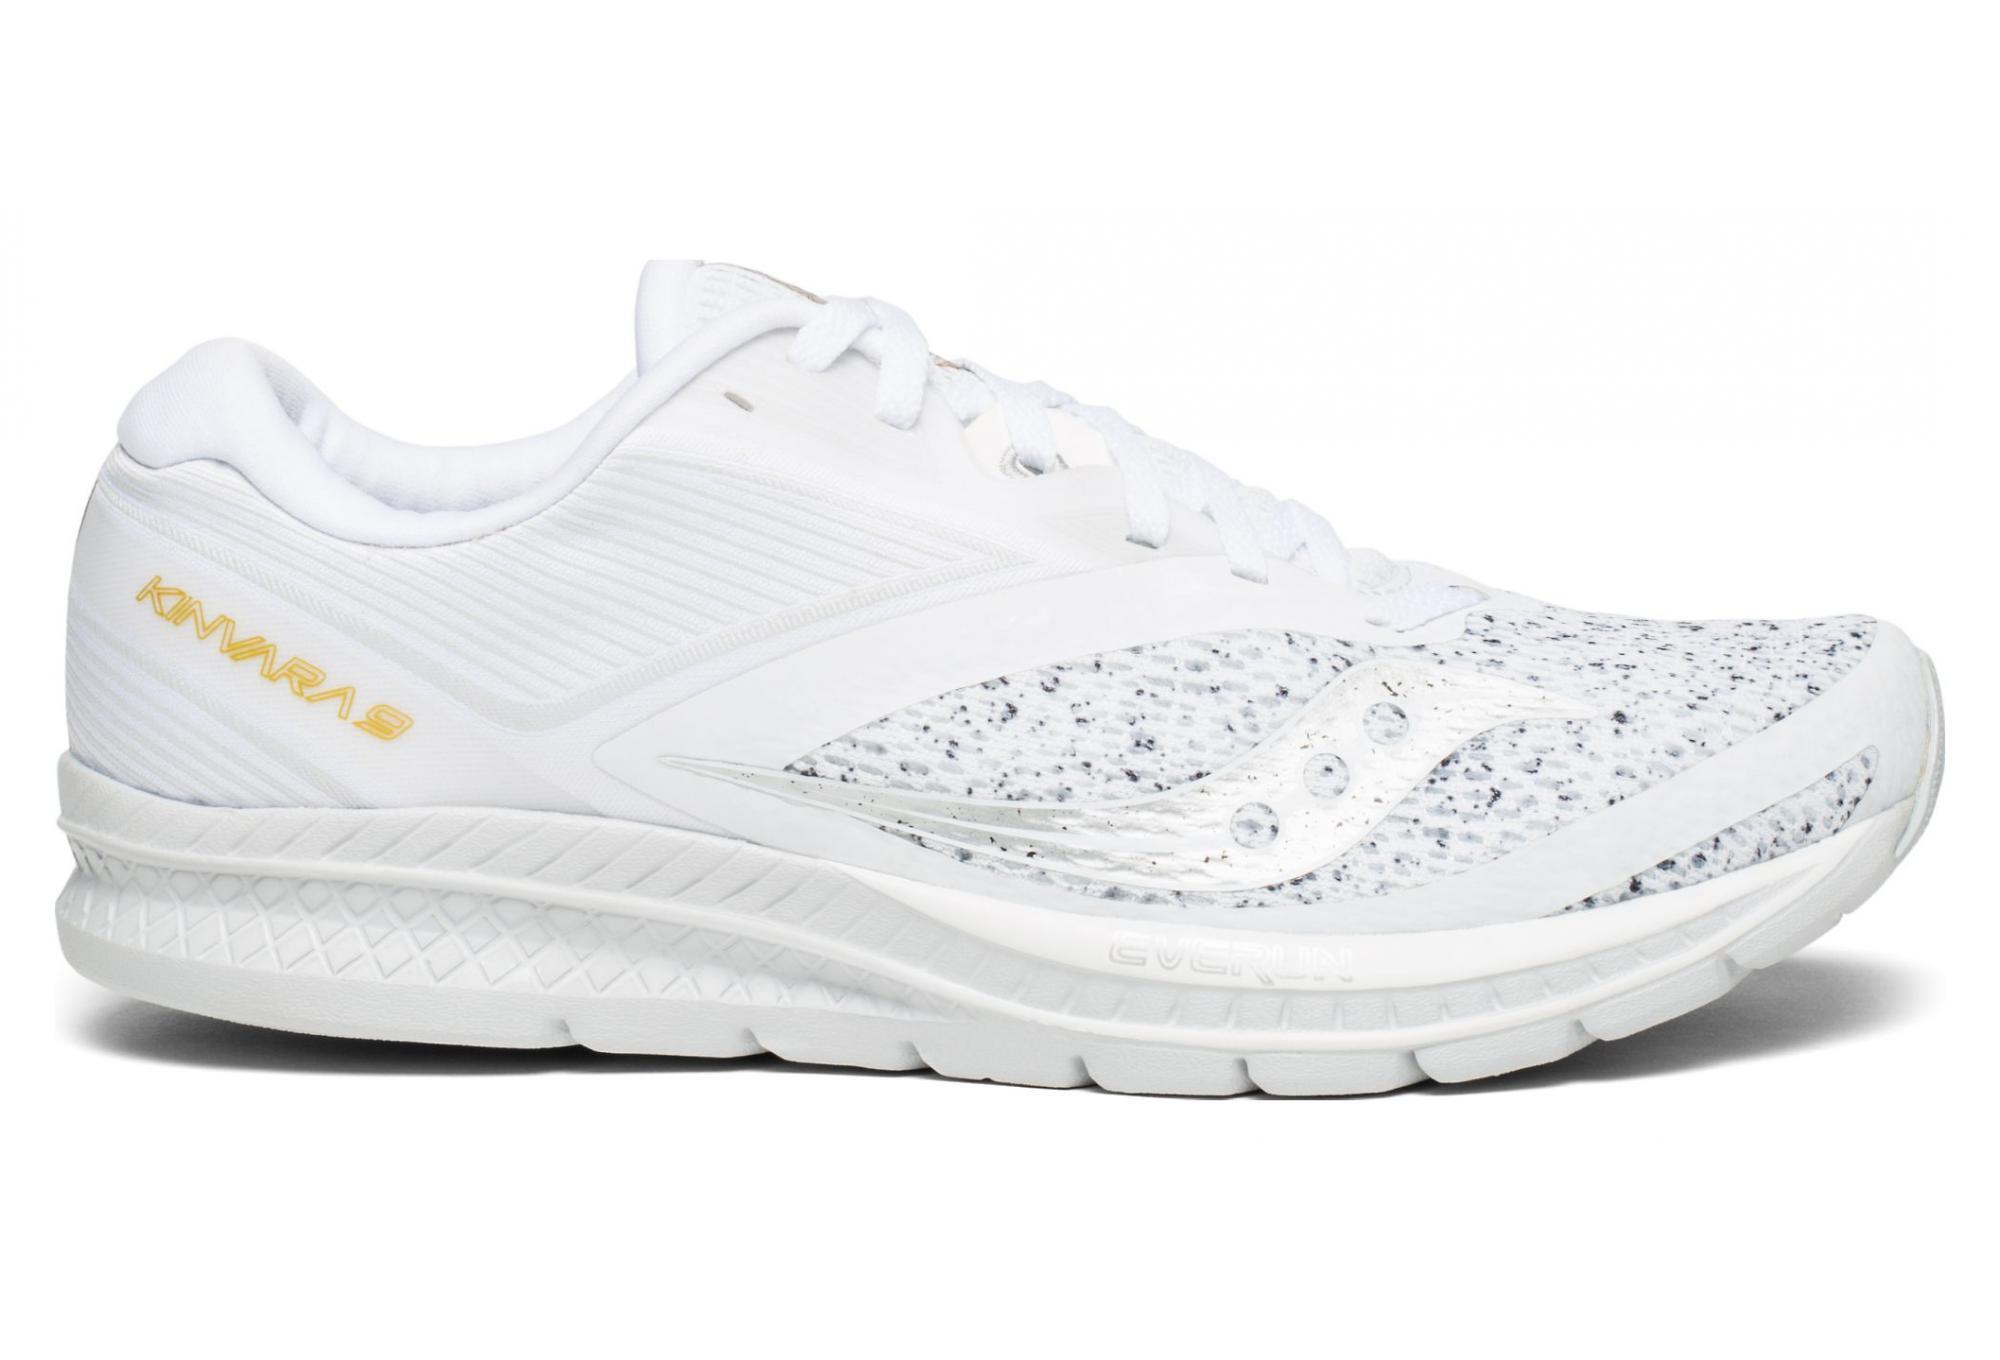 62cc2b9f5472 Saucony Kinvara 9 Shoes White Noise